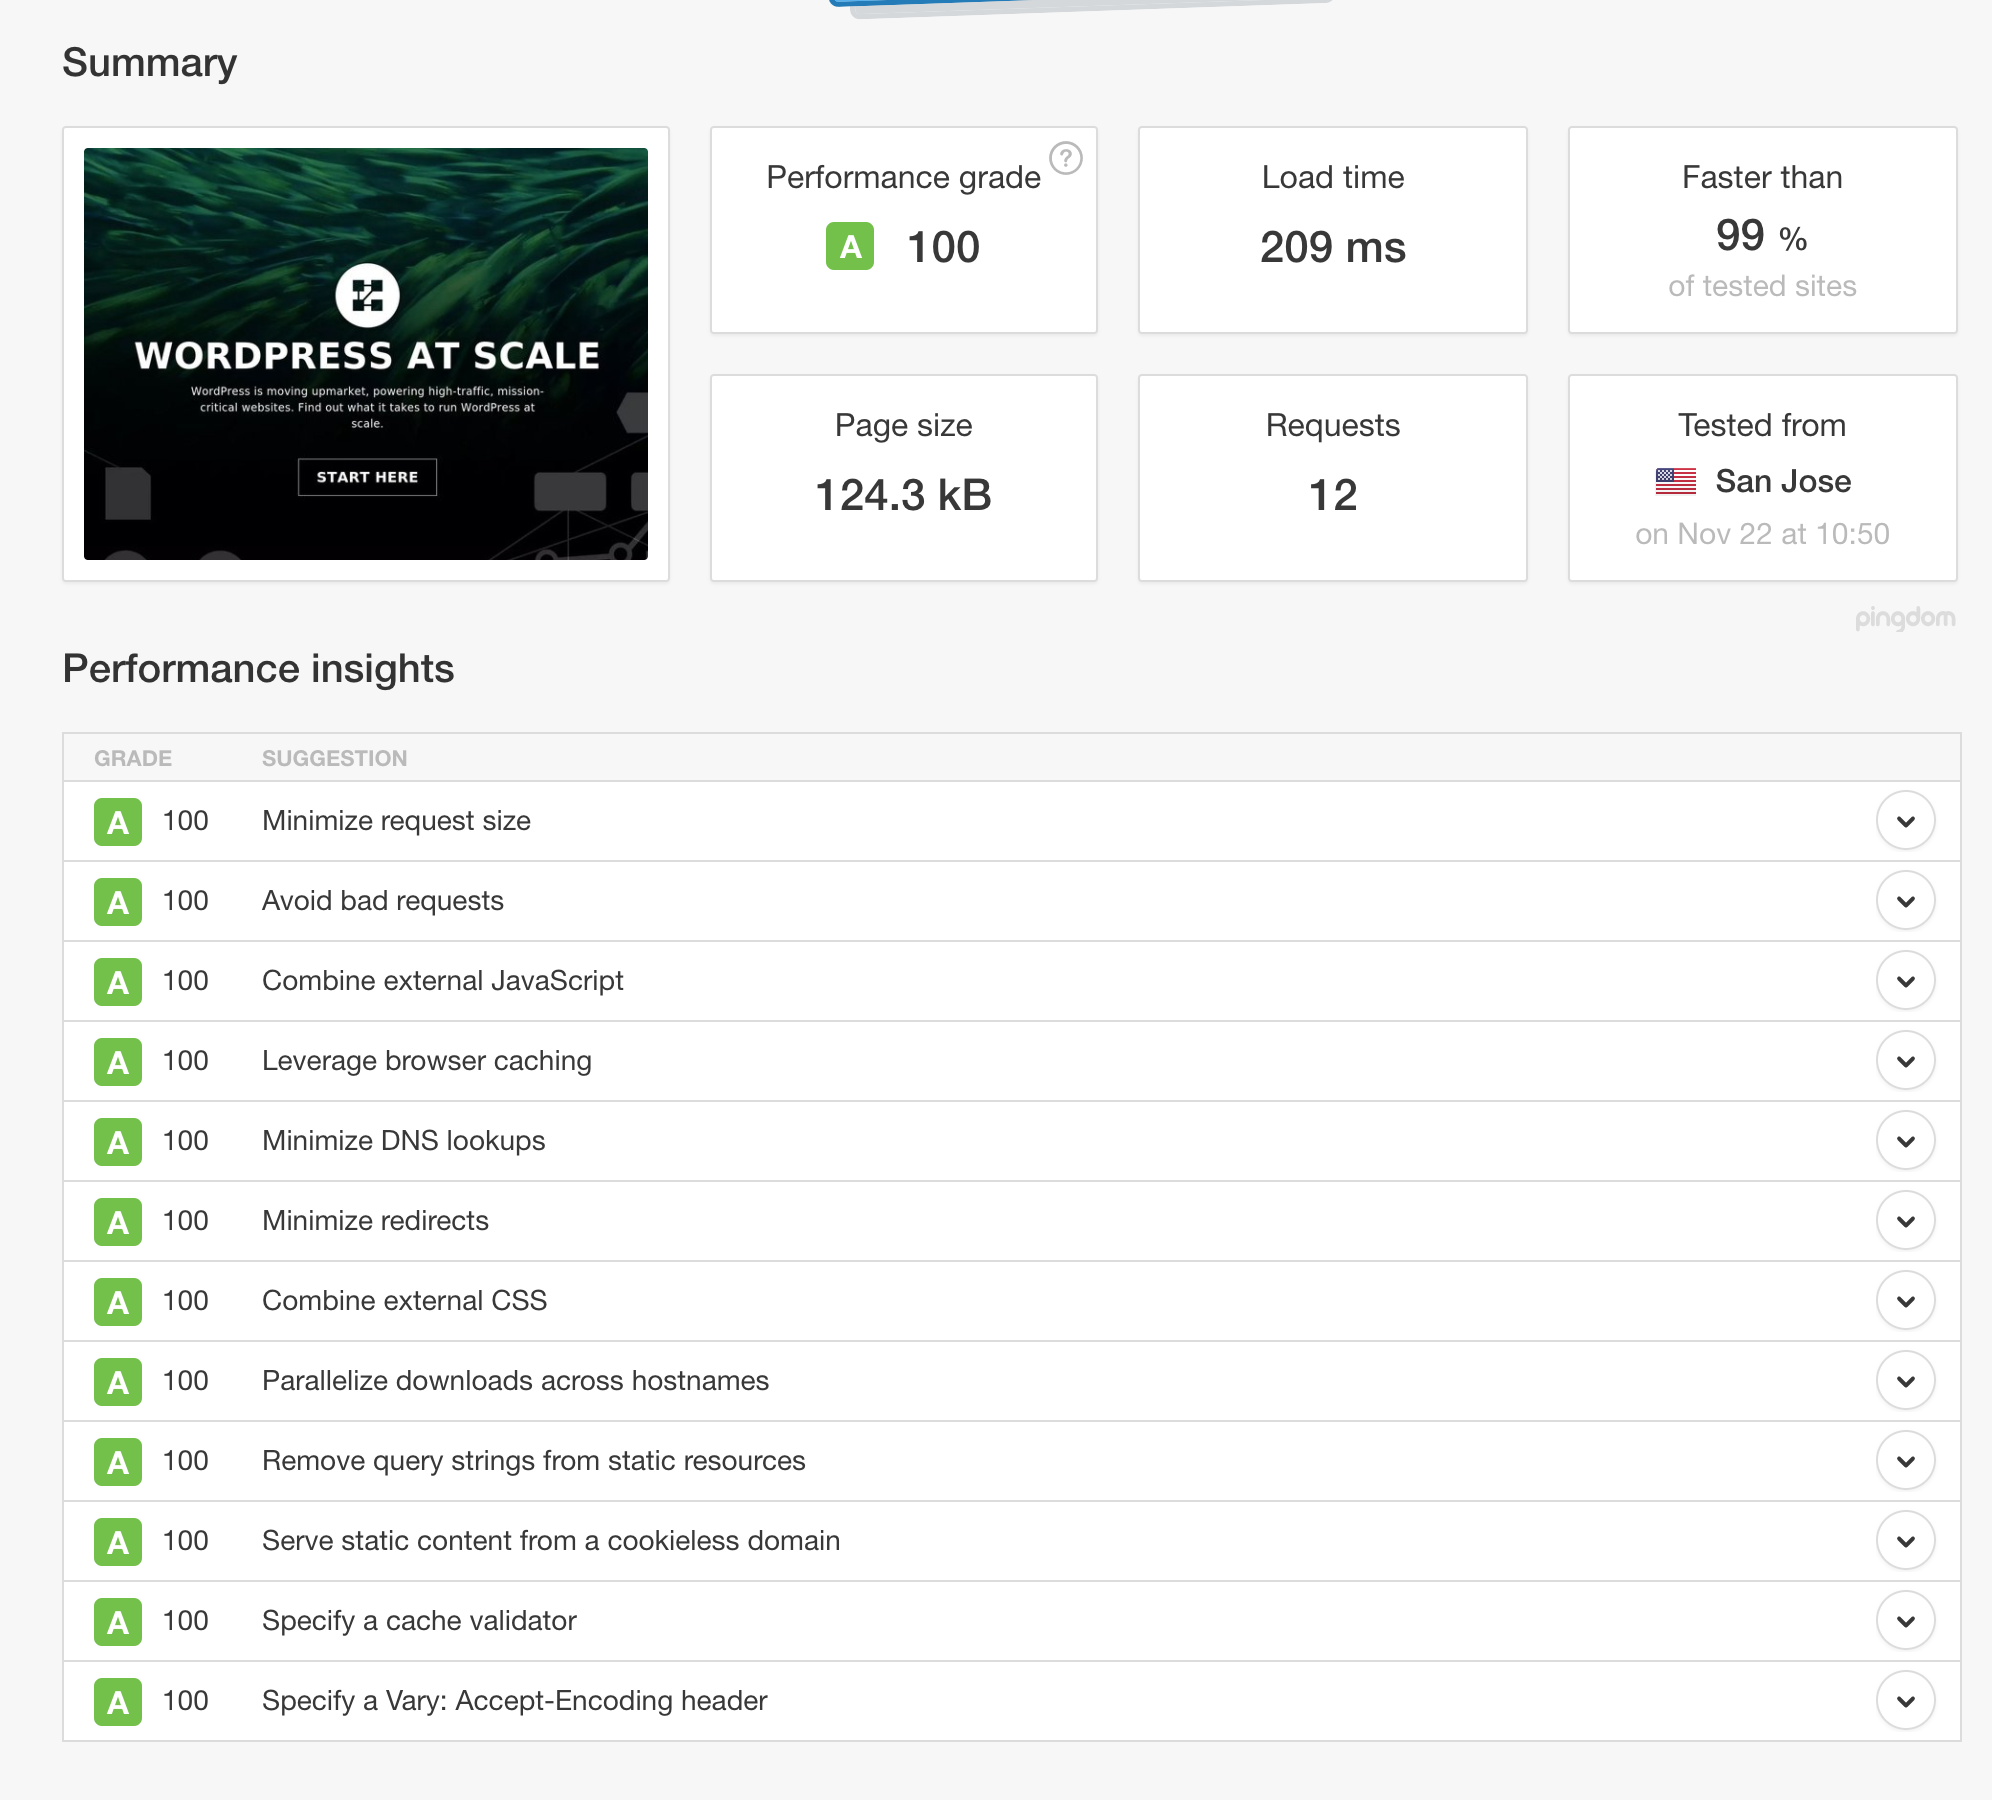 Addtional post-improvement results screenshot